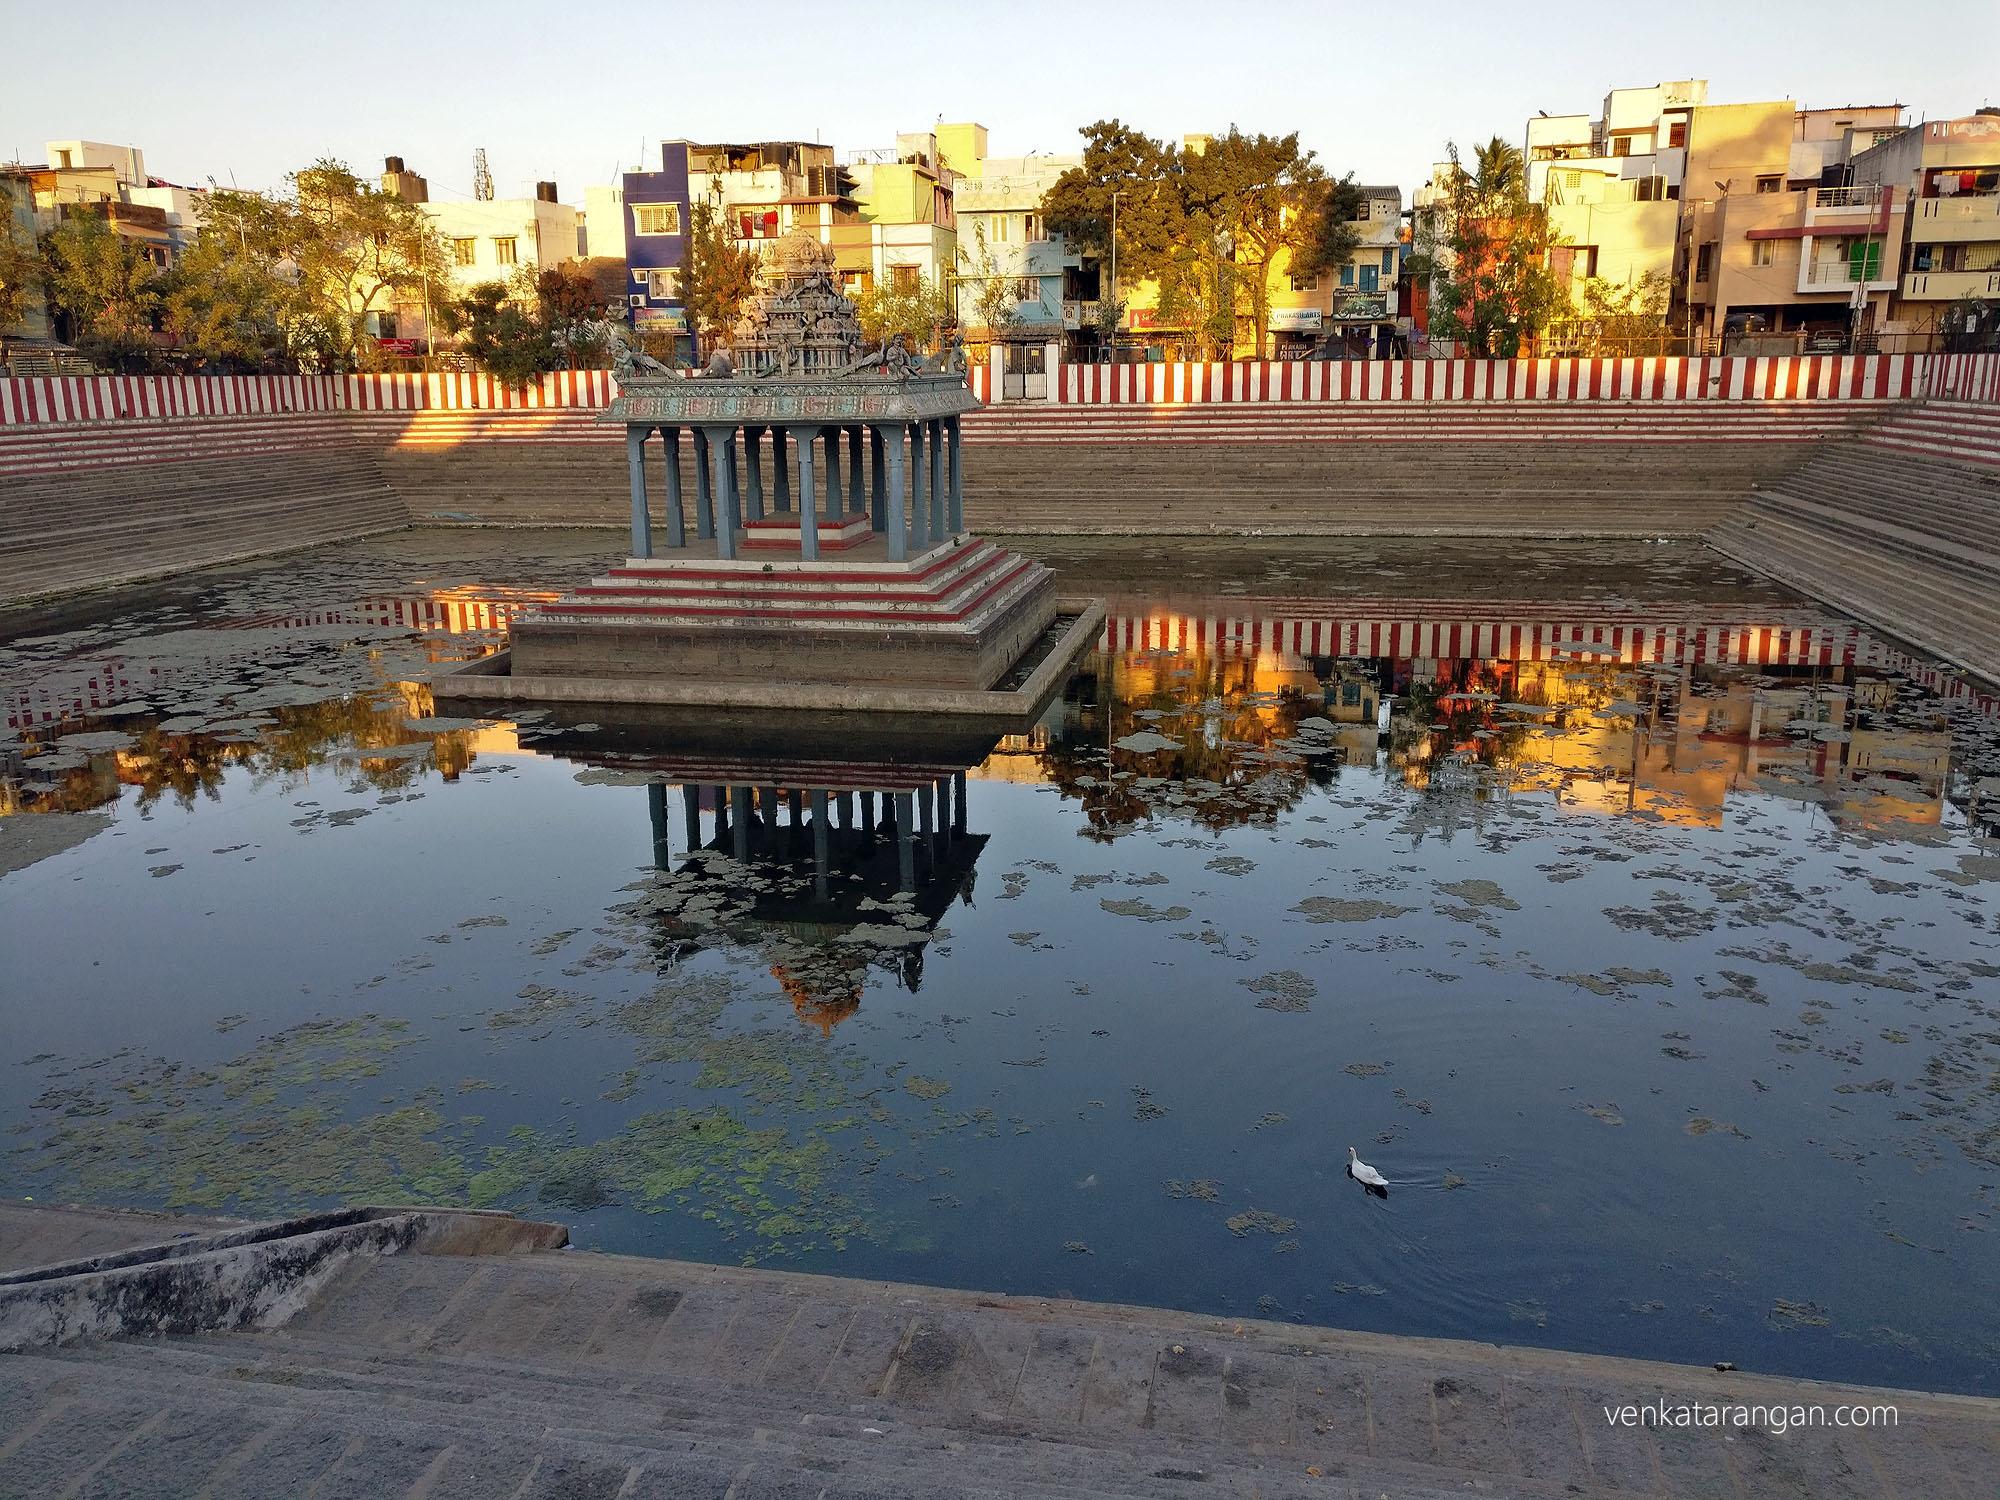 Temple Tank - வடபழநி முருகர் கோயில் குளம்